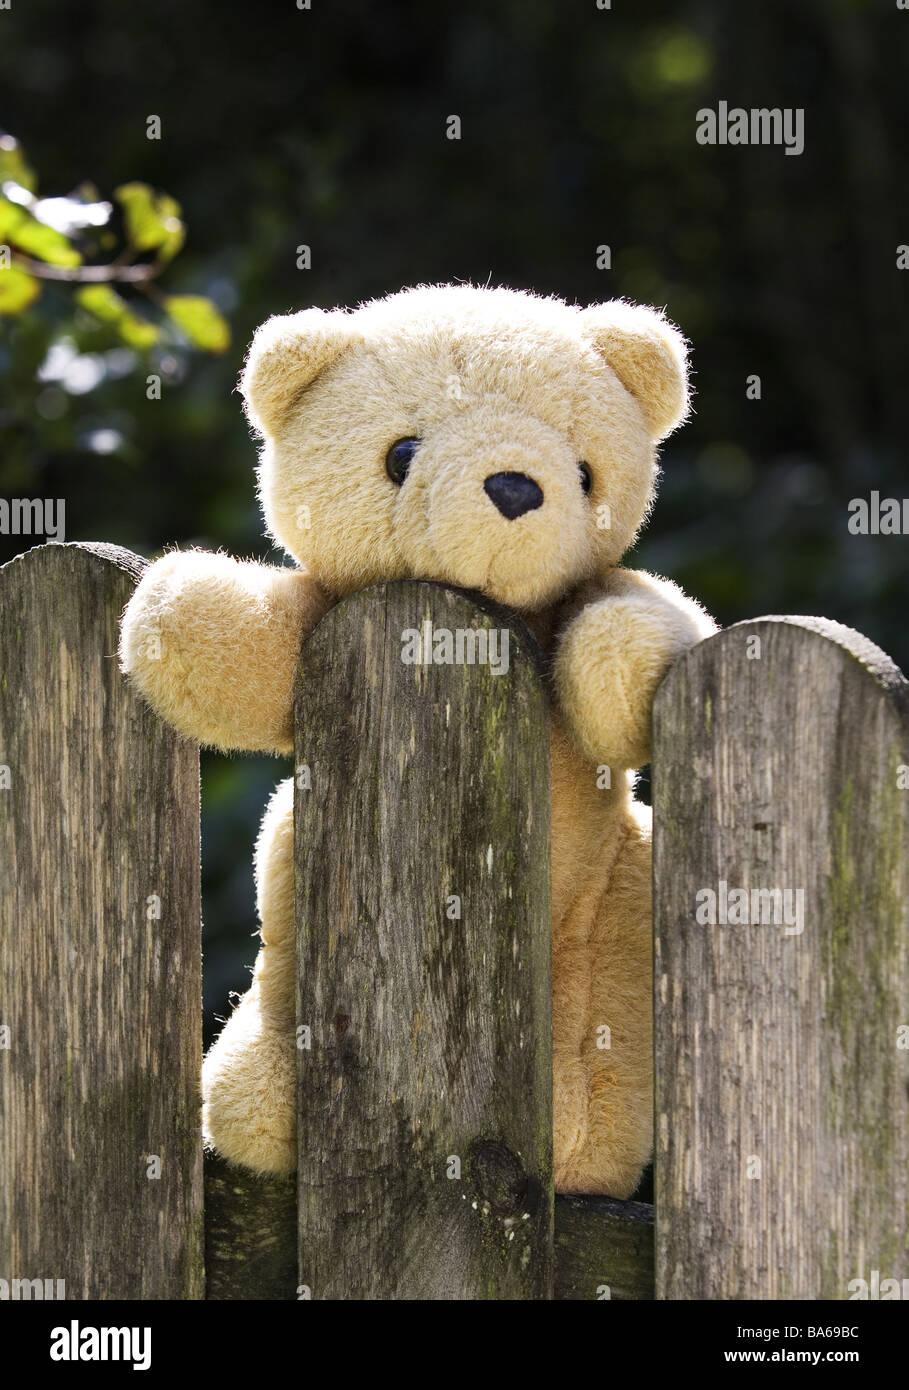 Holz Zaun Detail Teddy Bretterzaun Zaunlatten Die Holz Lamellen